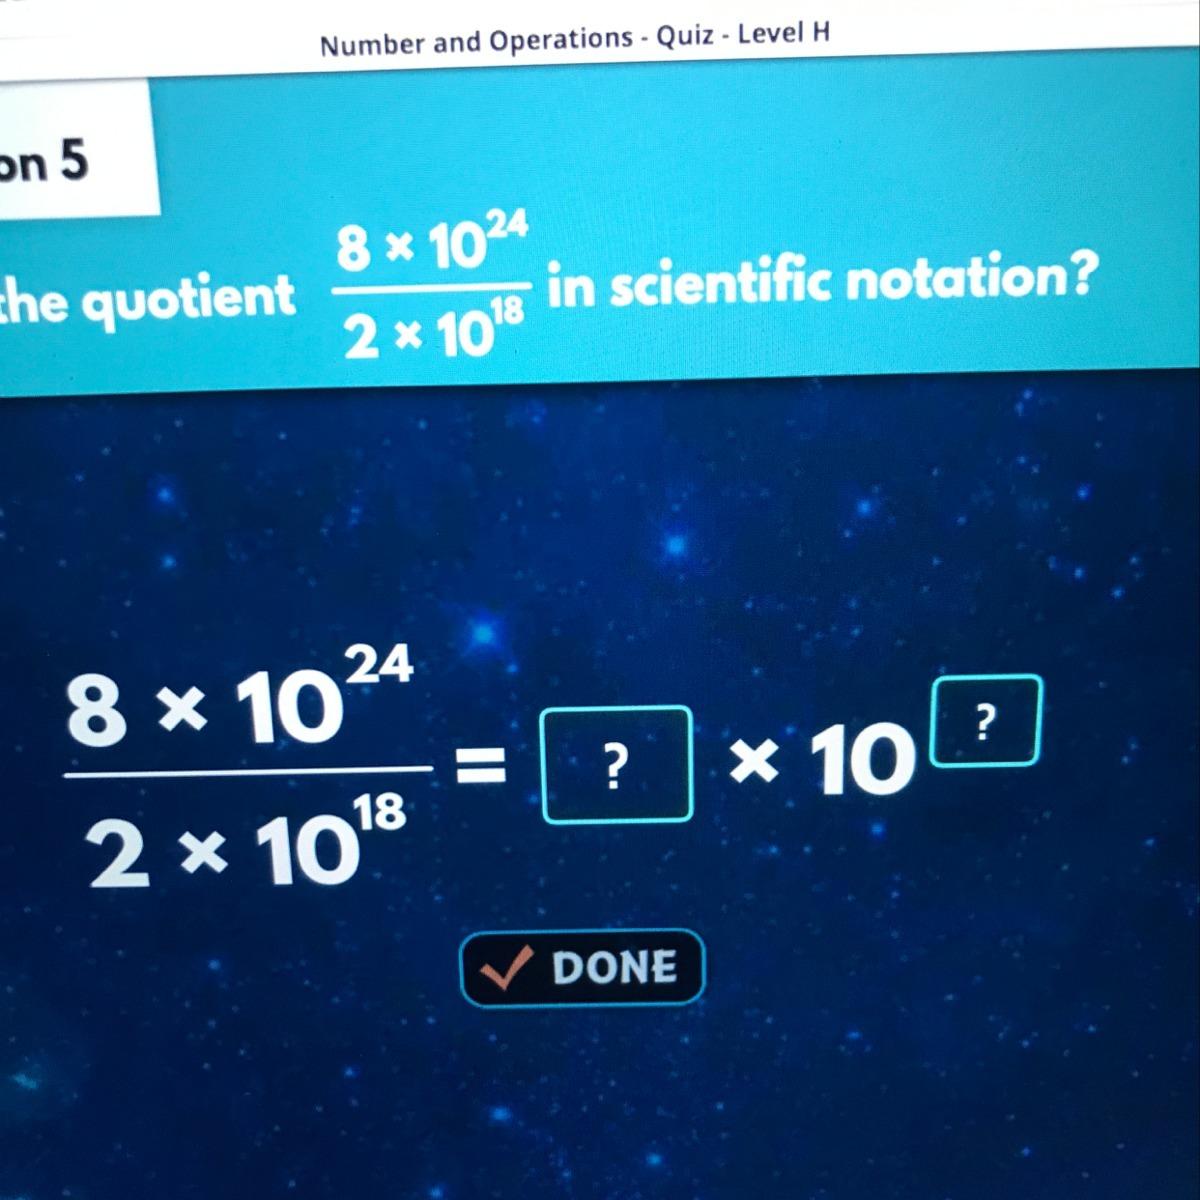 What Is The Quotient Of 8x10 24 2x10 18 In Scientific